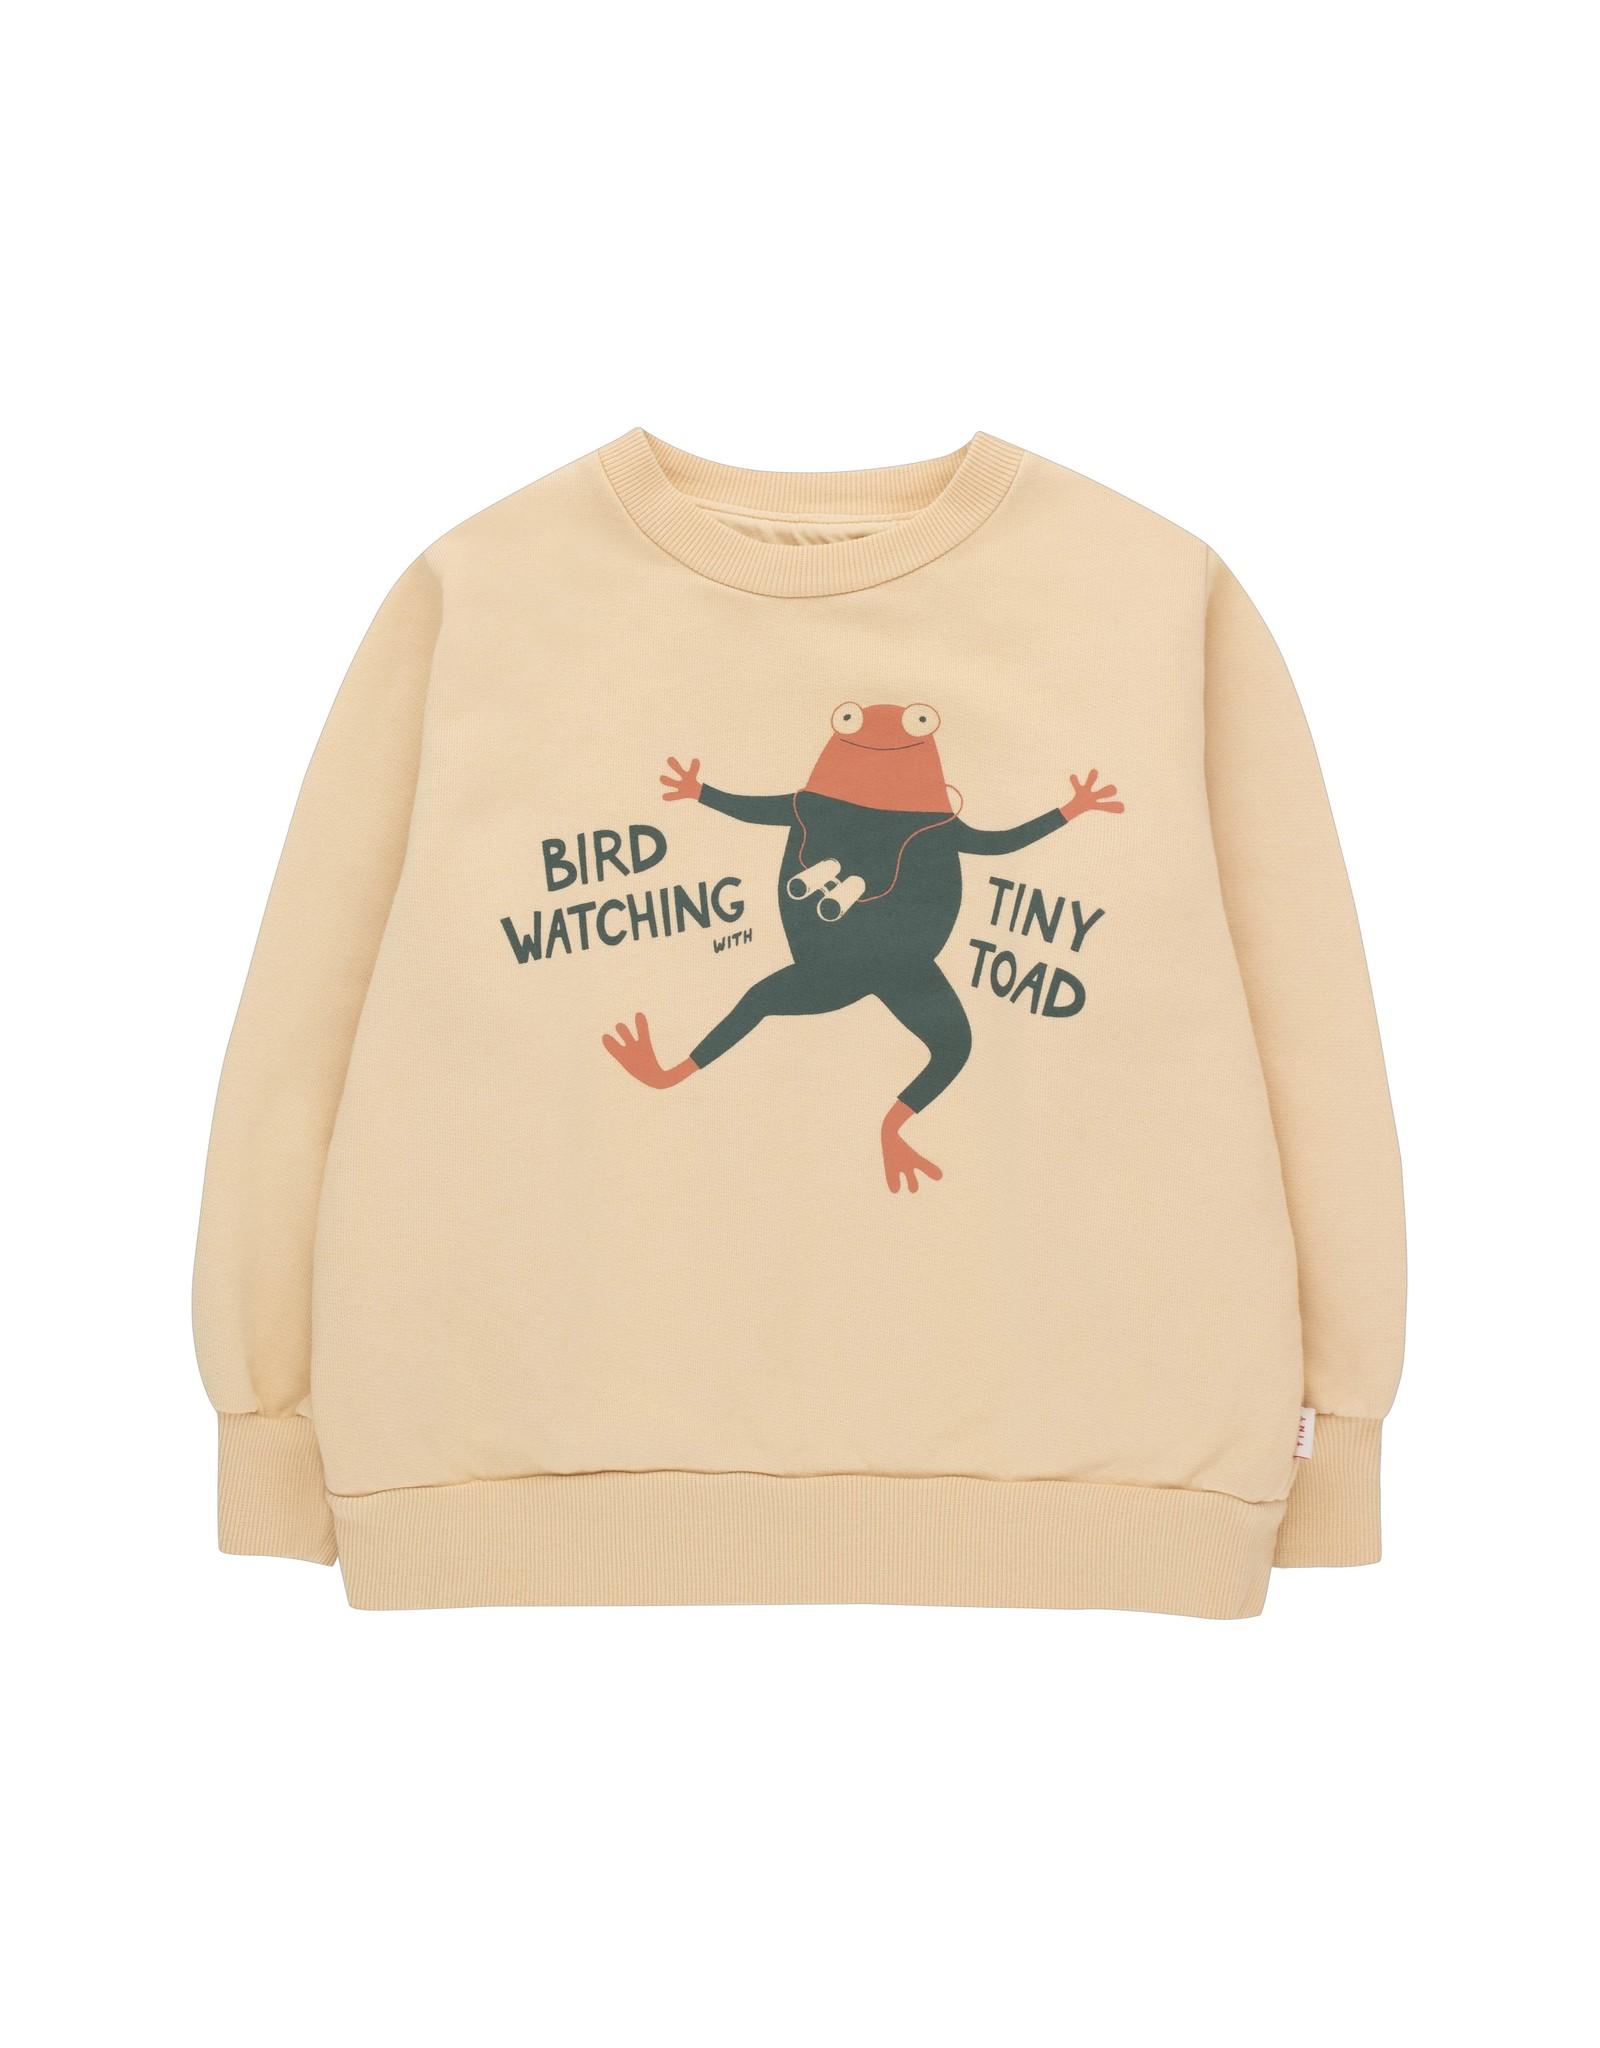 Tinycottons Tiny Toad Sweatshirt